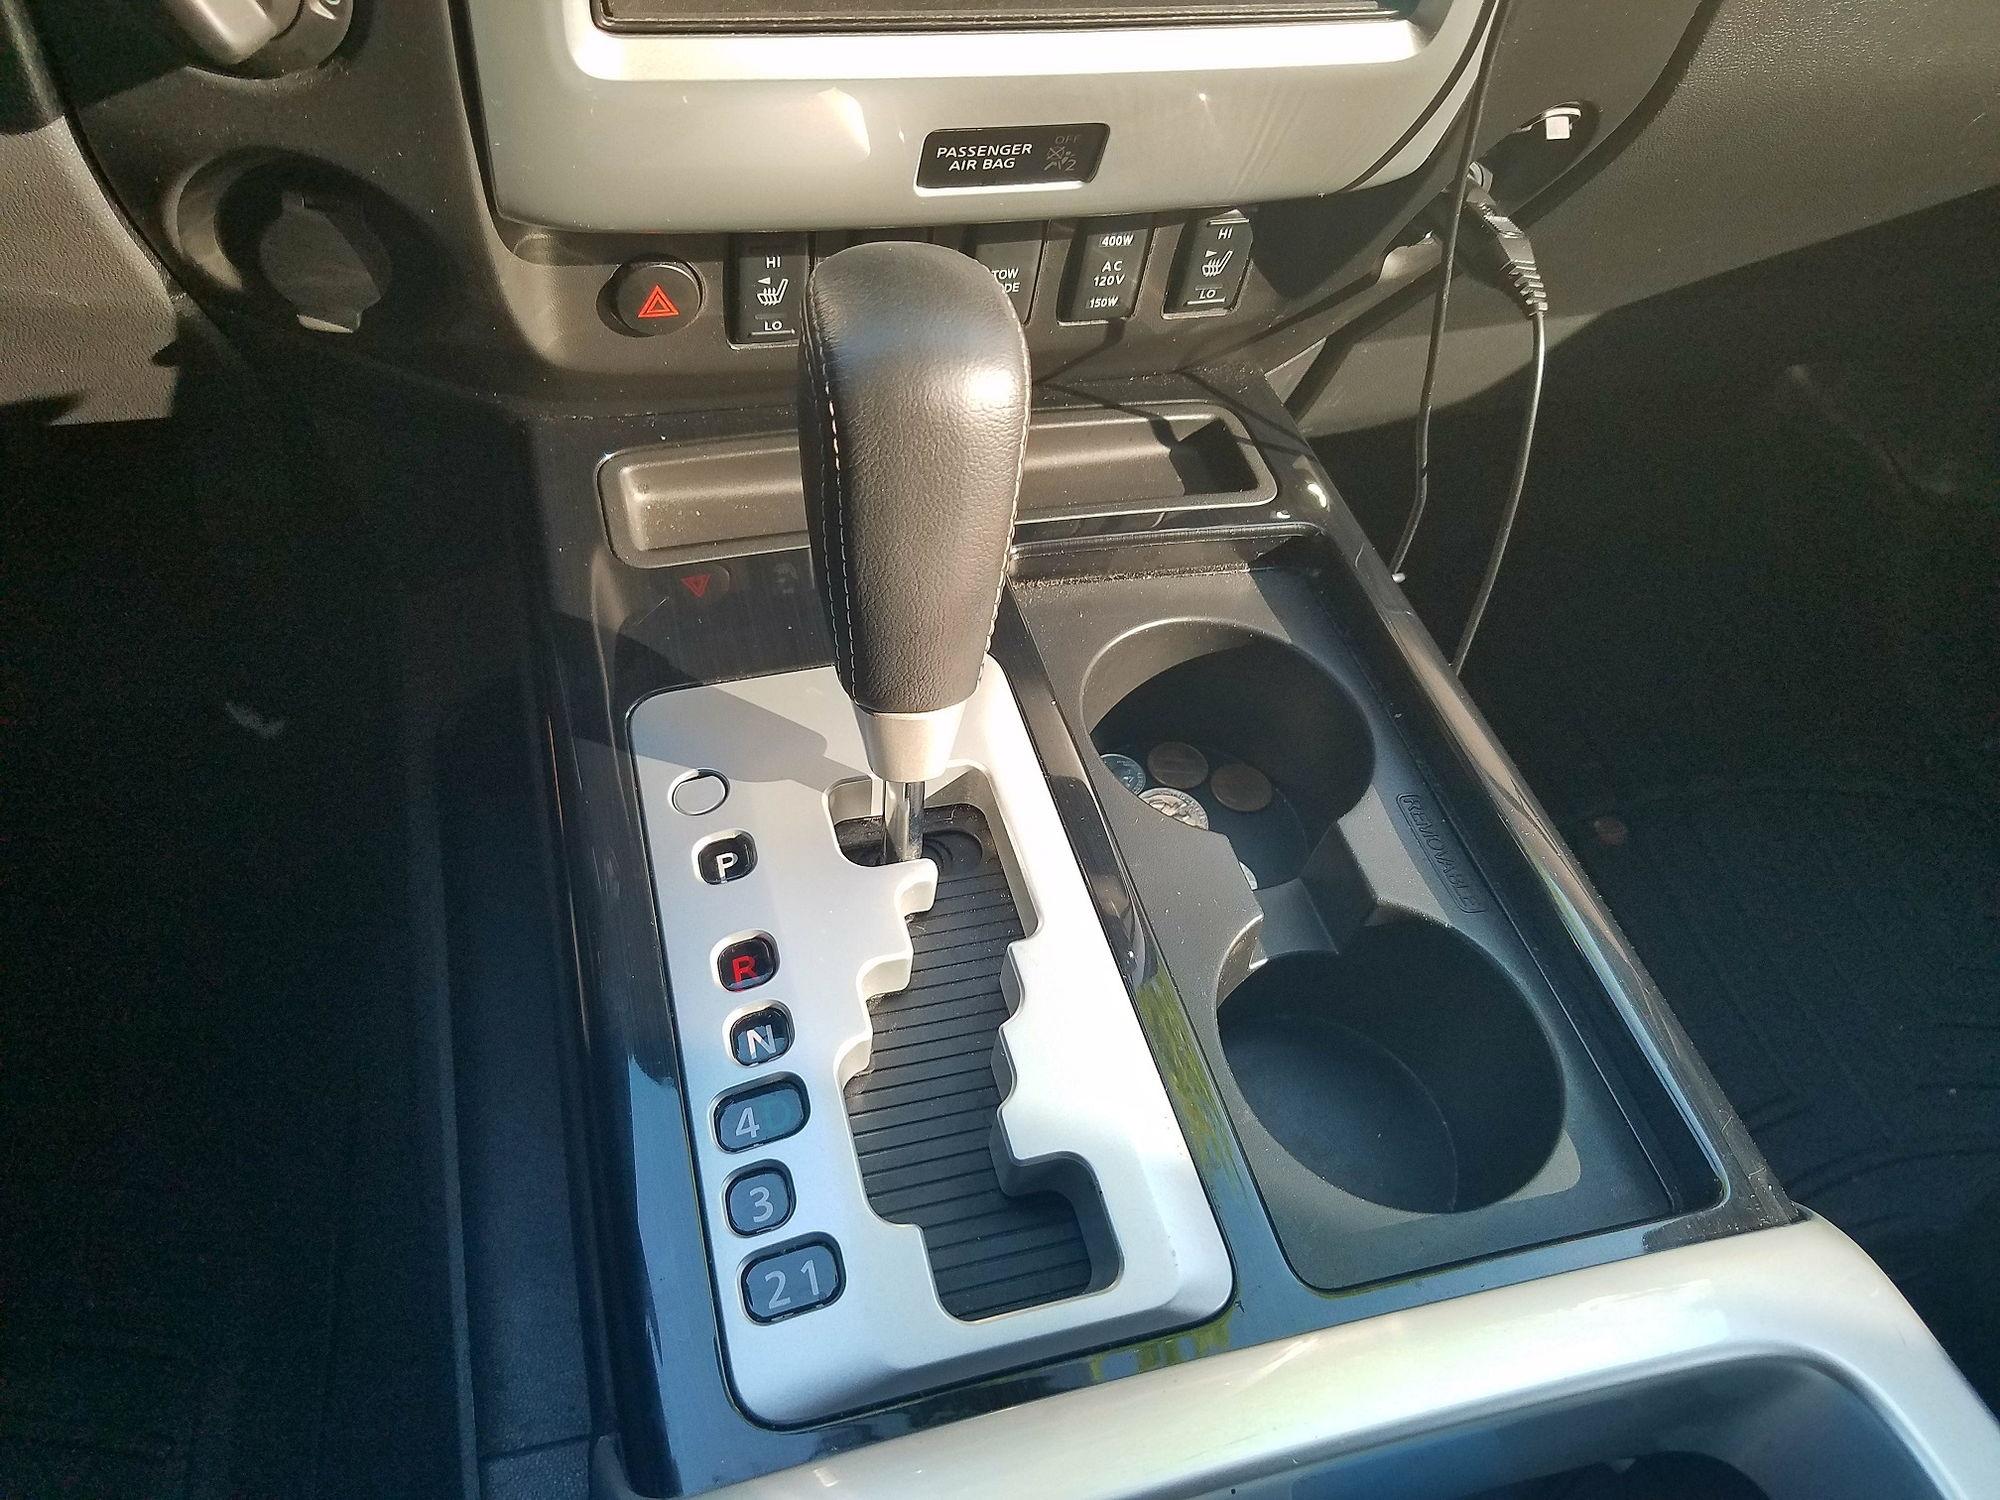 2014 titan pro 4x 4wd crew cab  navi  leather  warranty everything